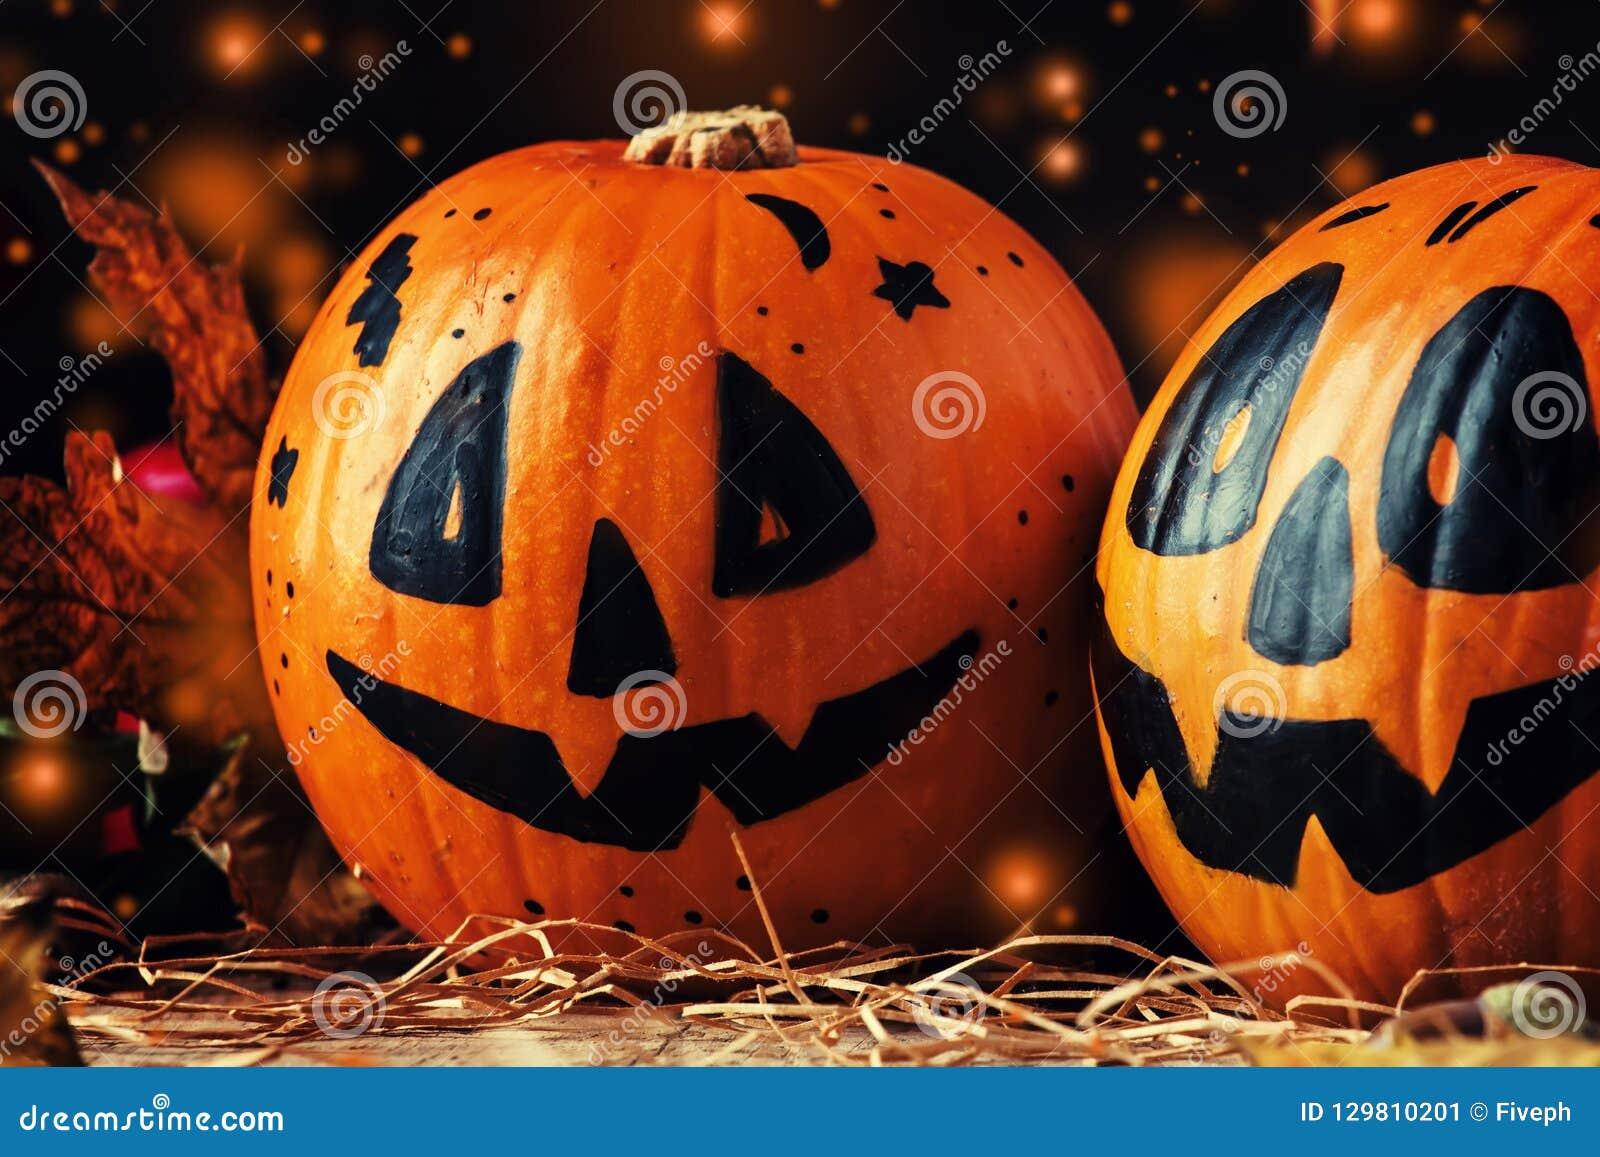 Pumpkin Drinking Straws Festive Spooky Orange Jack o Lantern Halloween Party